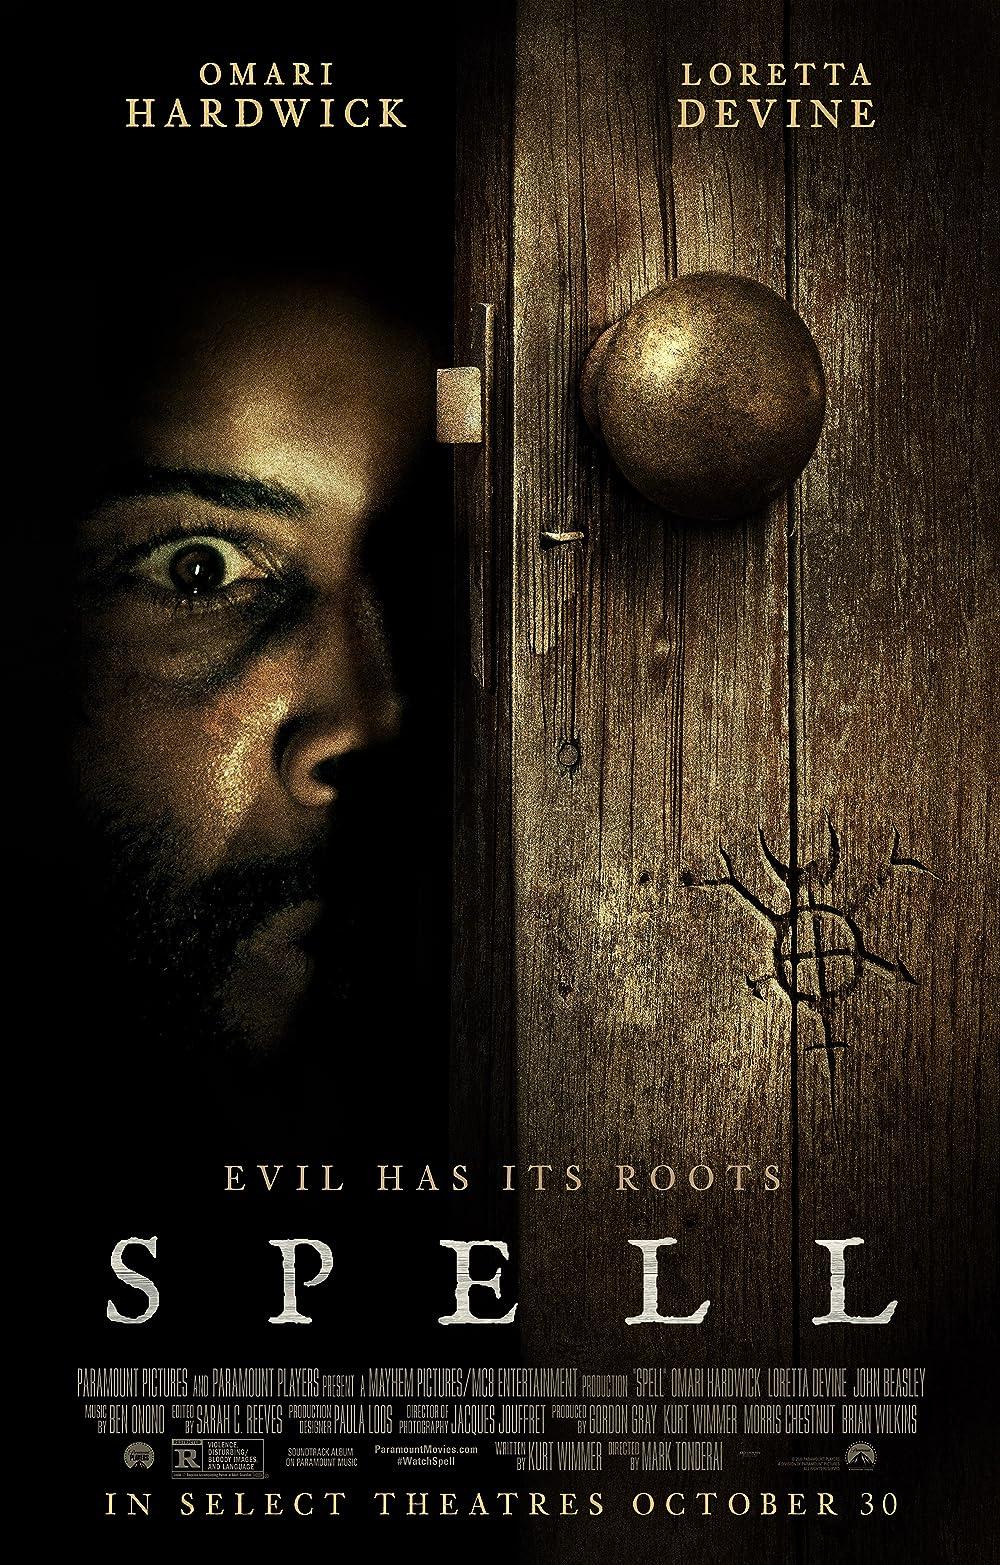 image poster from imdb - Spell (2020) • Movie